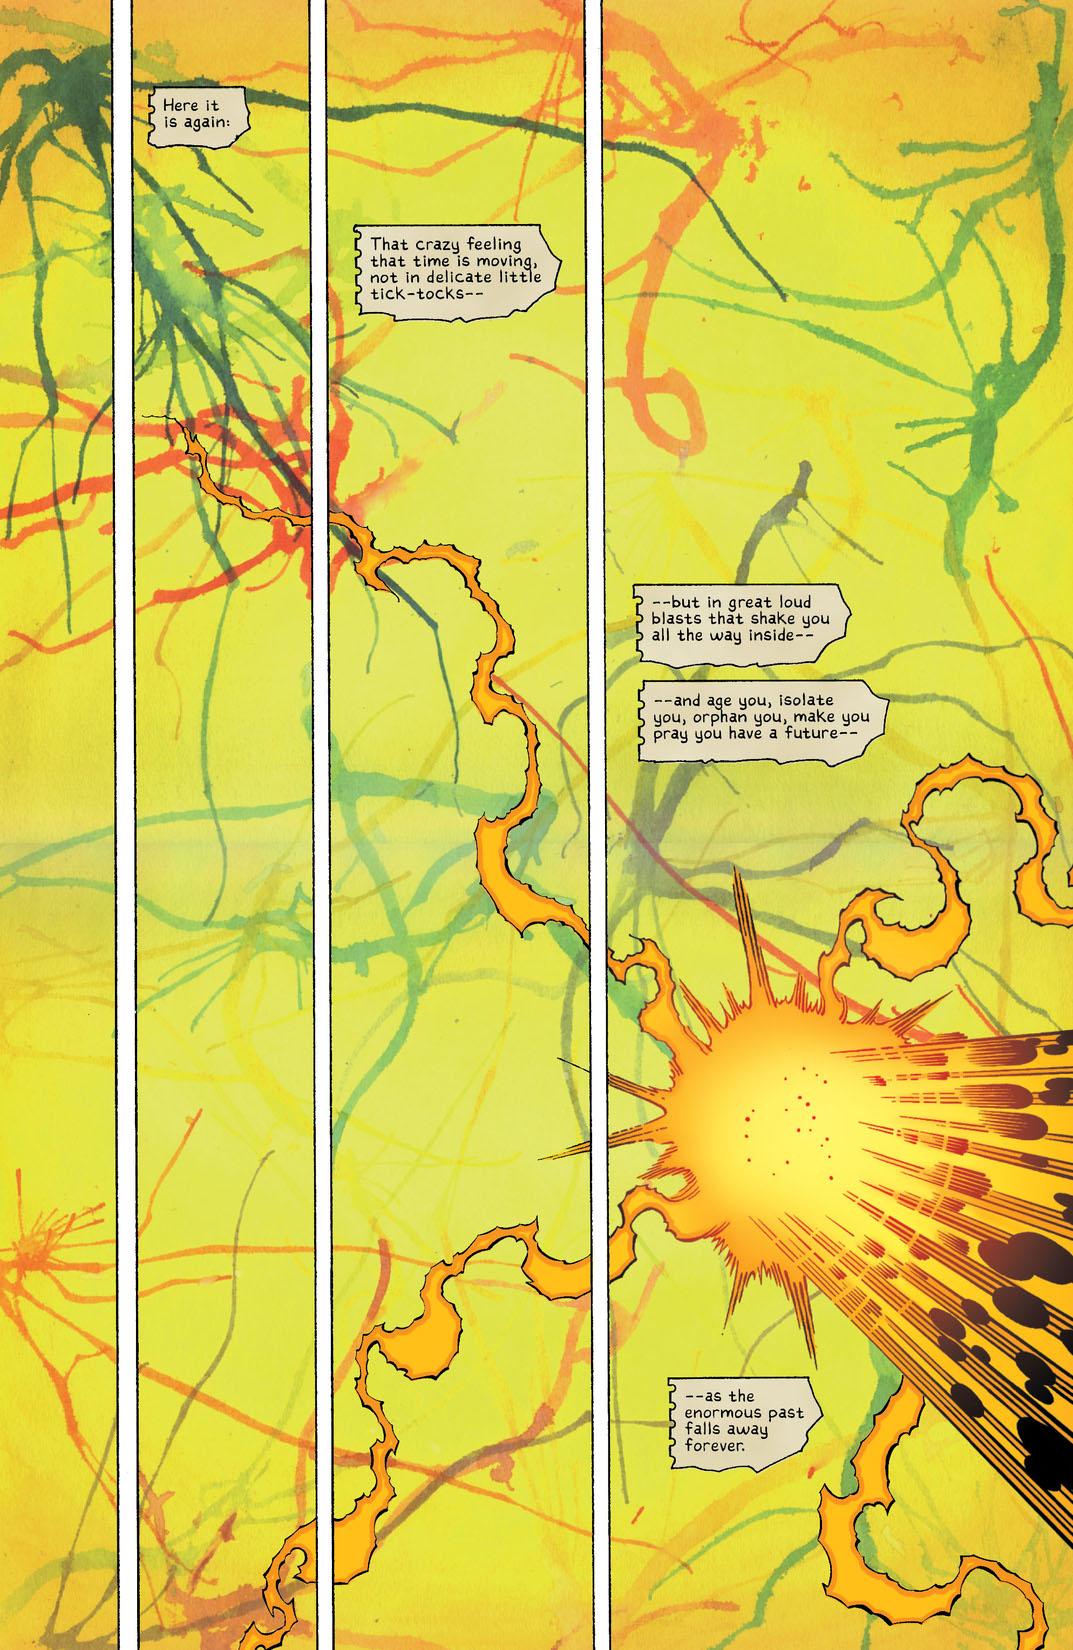 Read Hourman (1999-) #23 on DC Universe